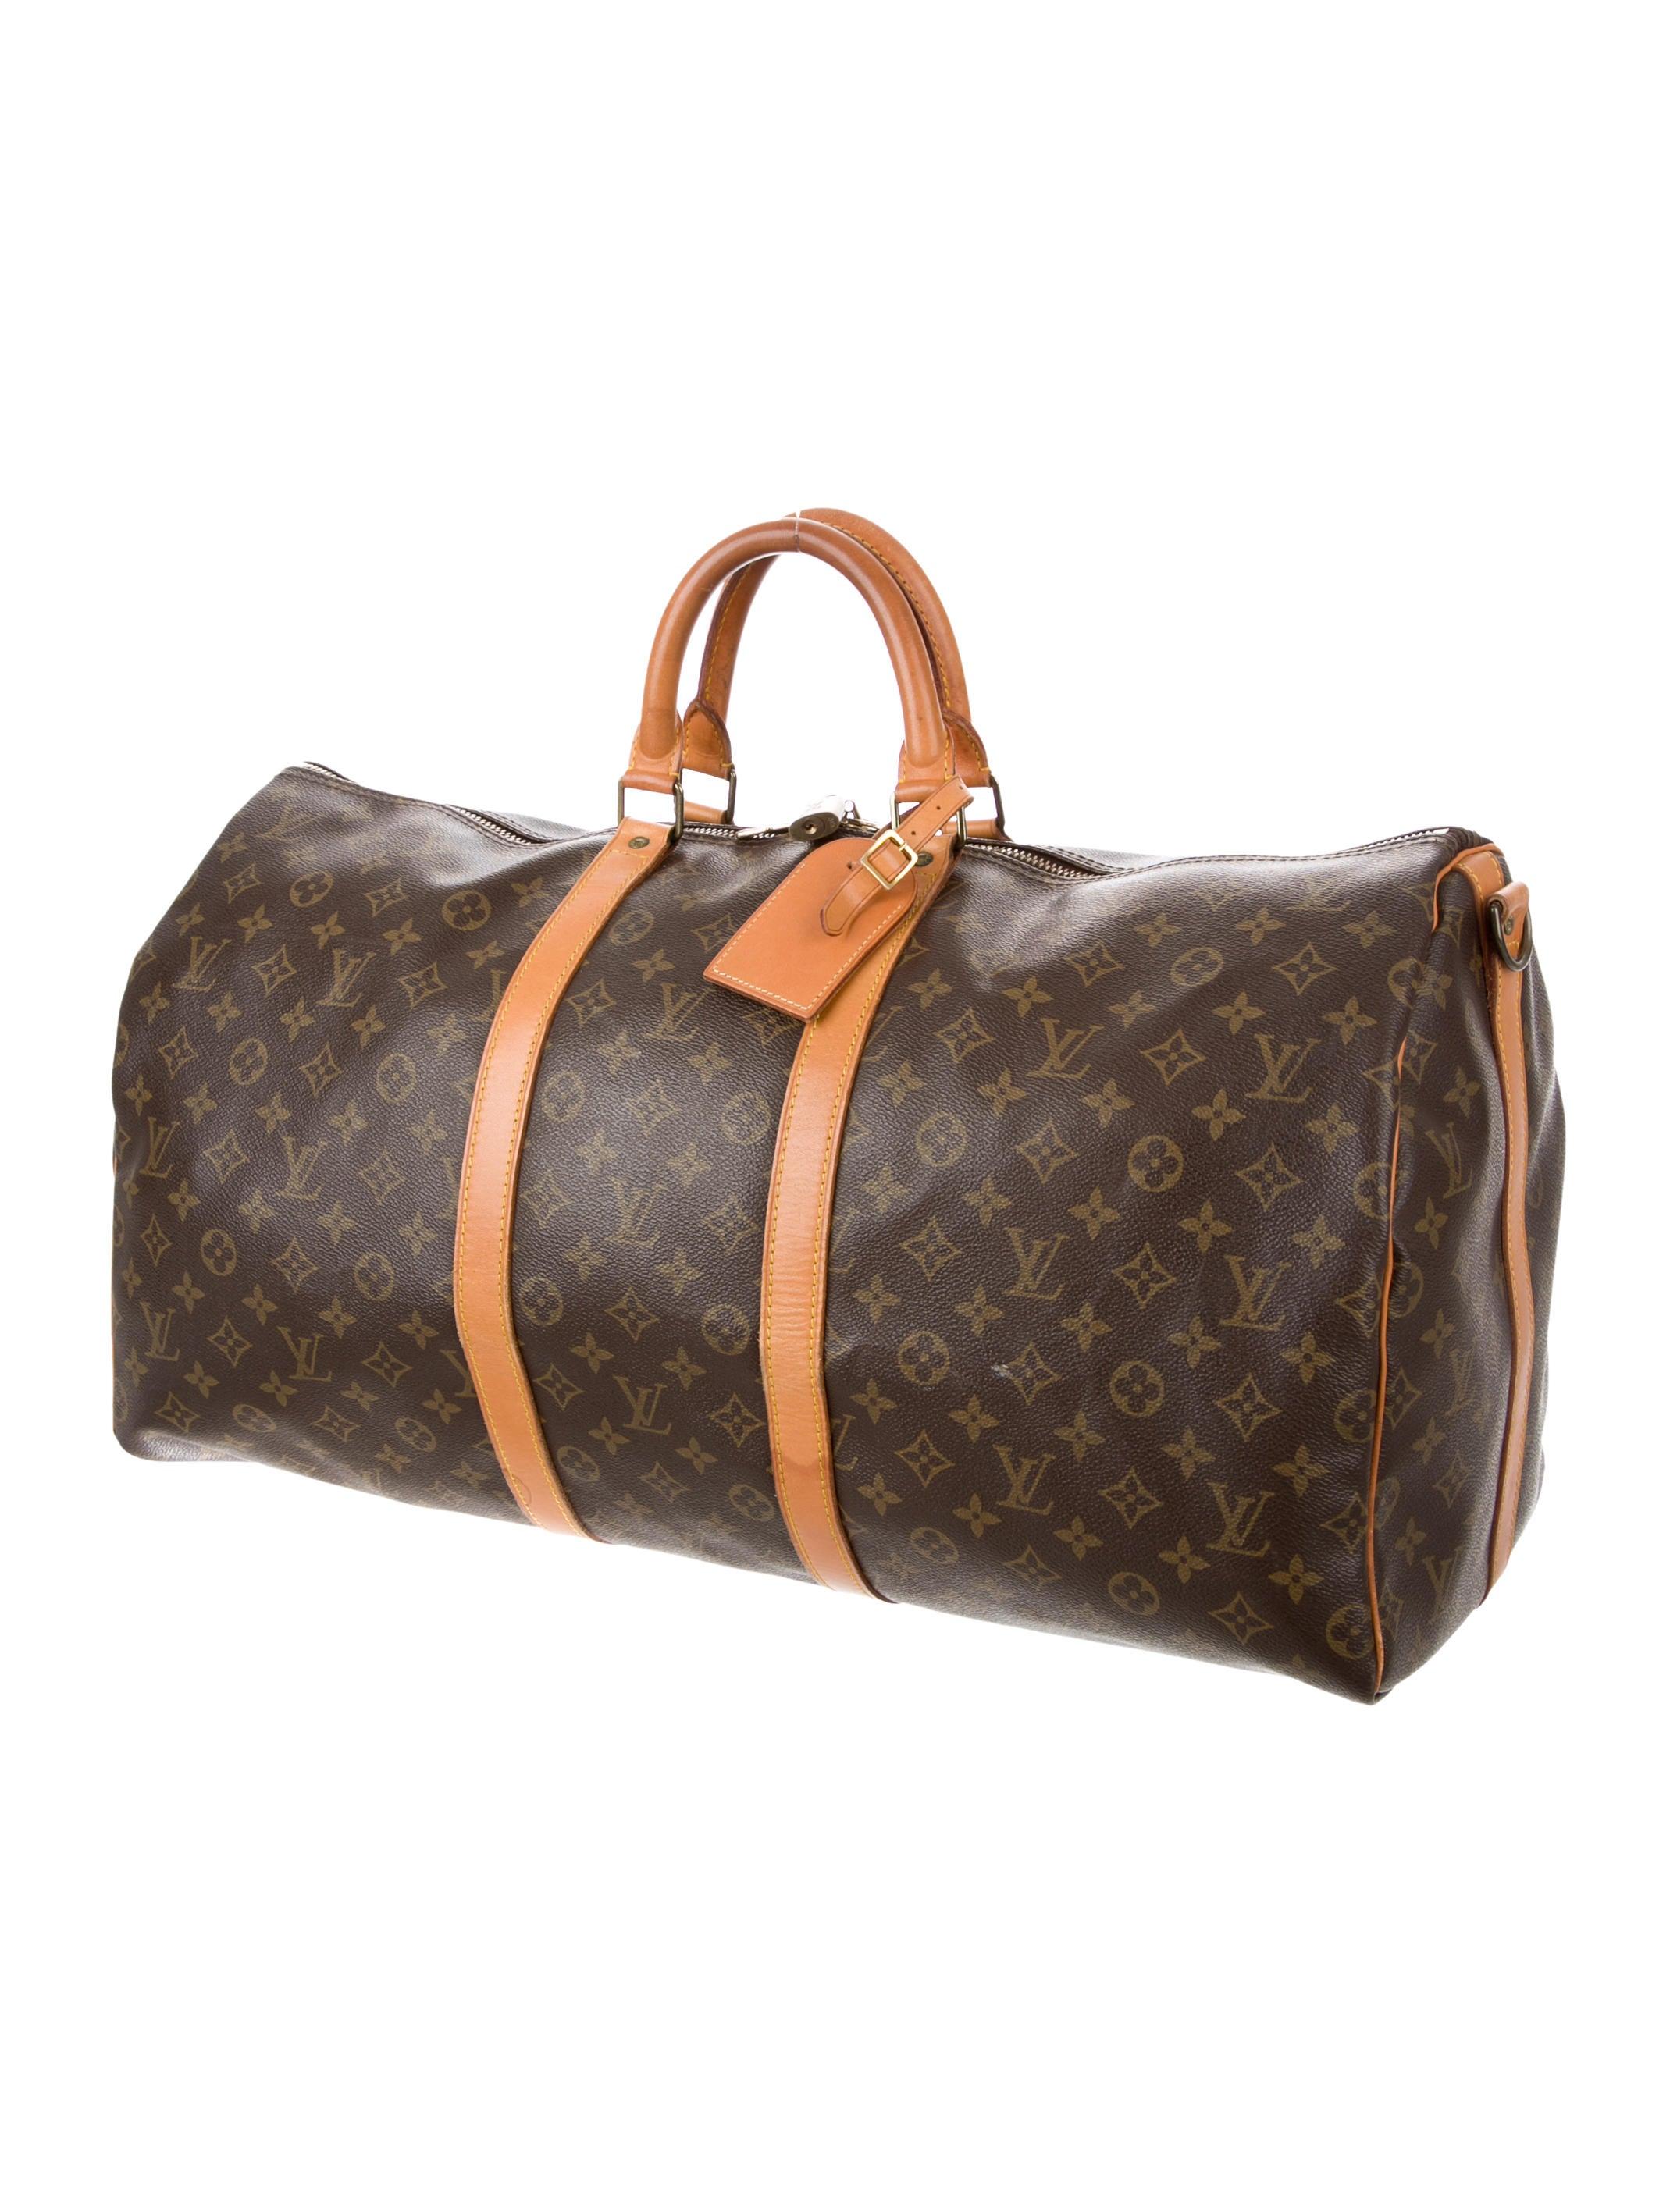 louis vuitton monogram keepall 55 bags lou119356 the realreal. Black Bedroom Furniture Sets. Home Design Ideas